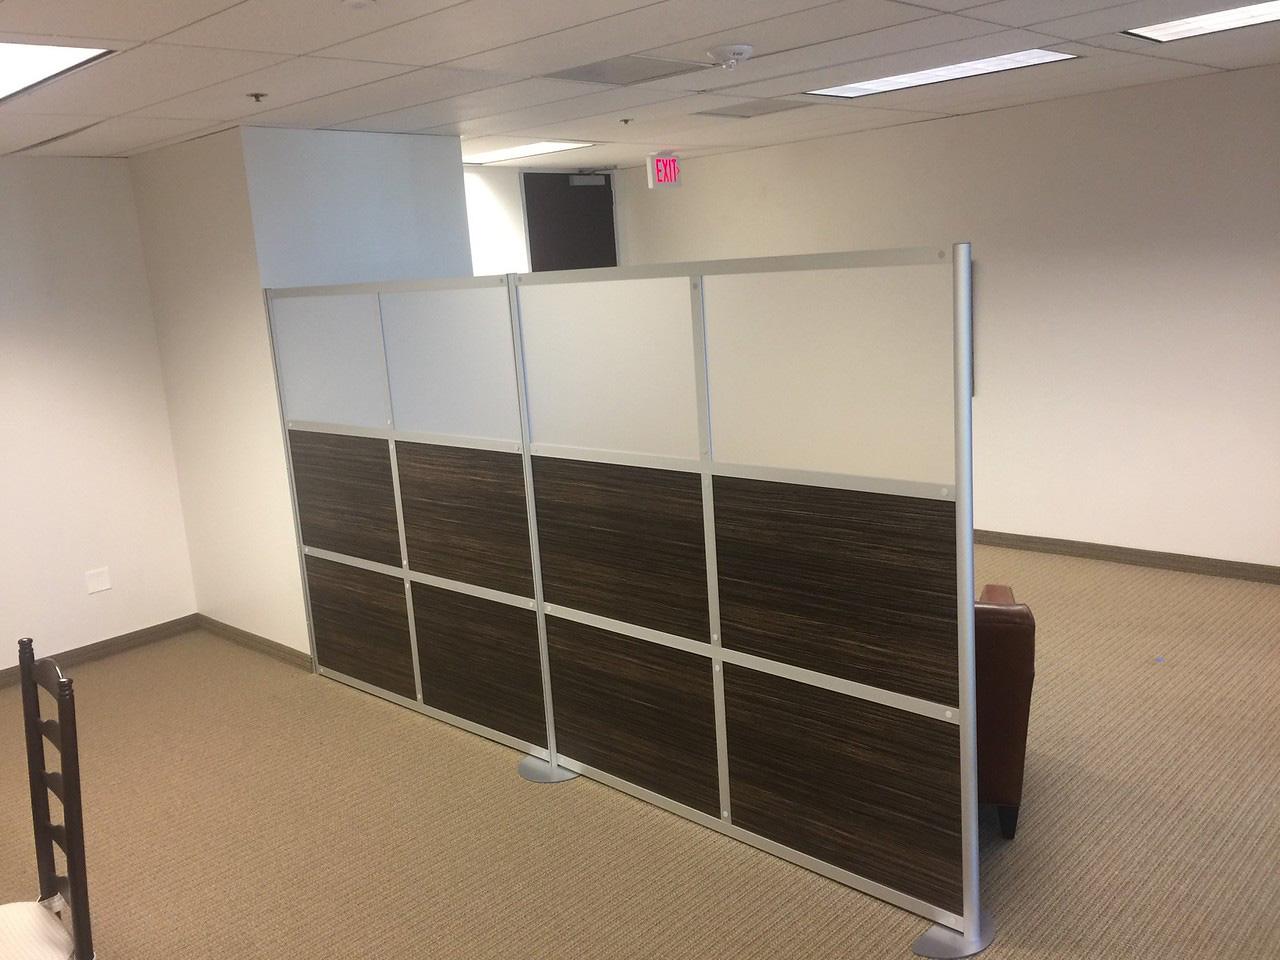 furniture-cubicles-in-daytona-beach-florida-4-.jpg